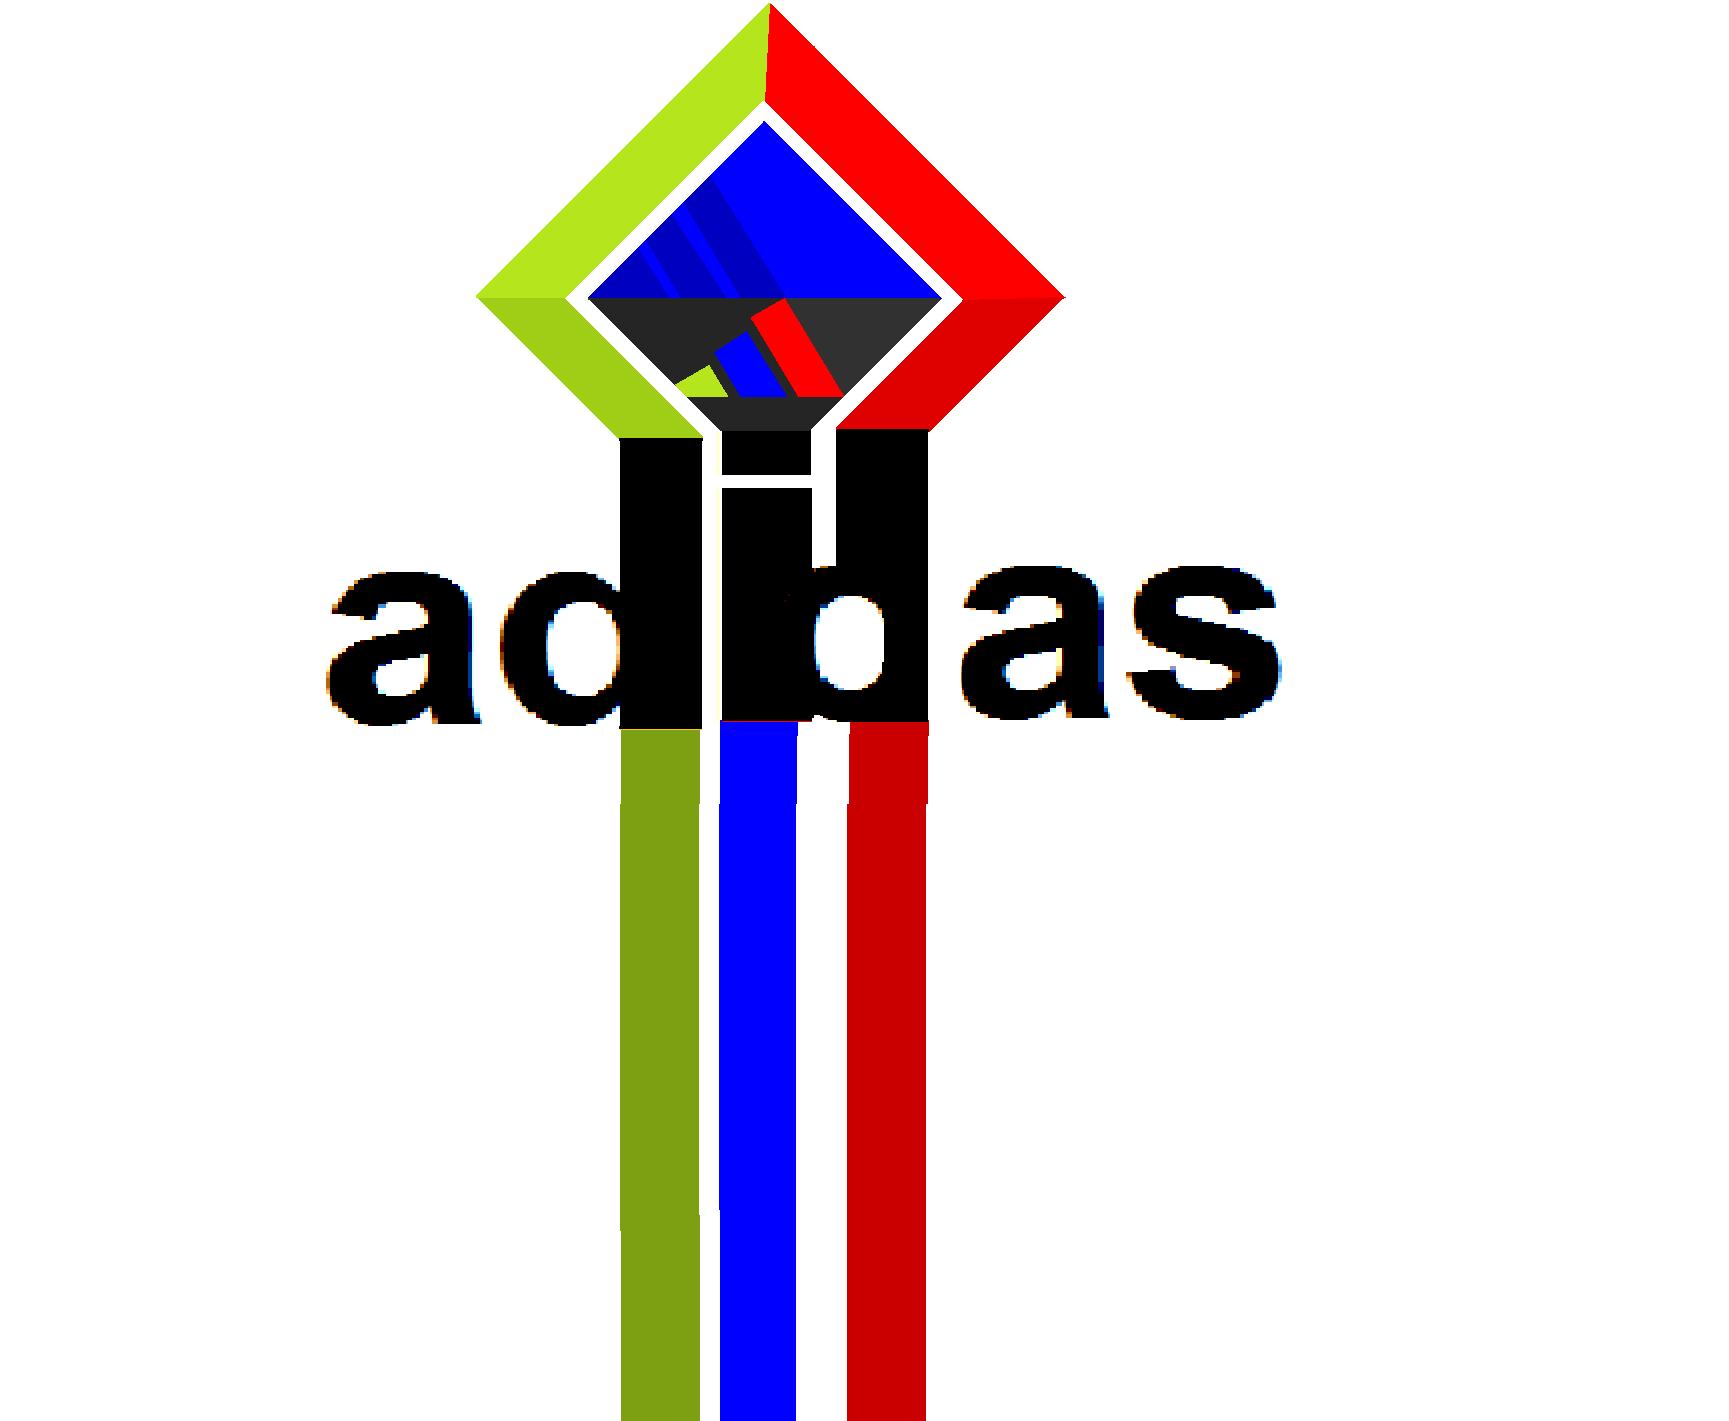 Adidas clipart stripe New logo Pinterest 3 design